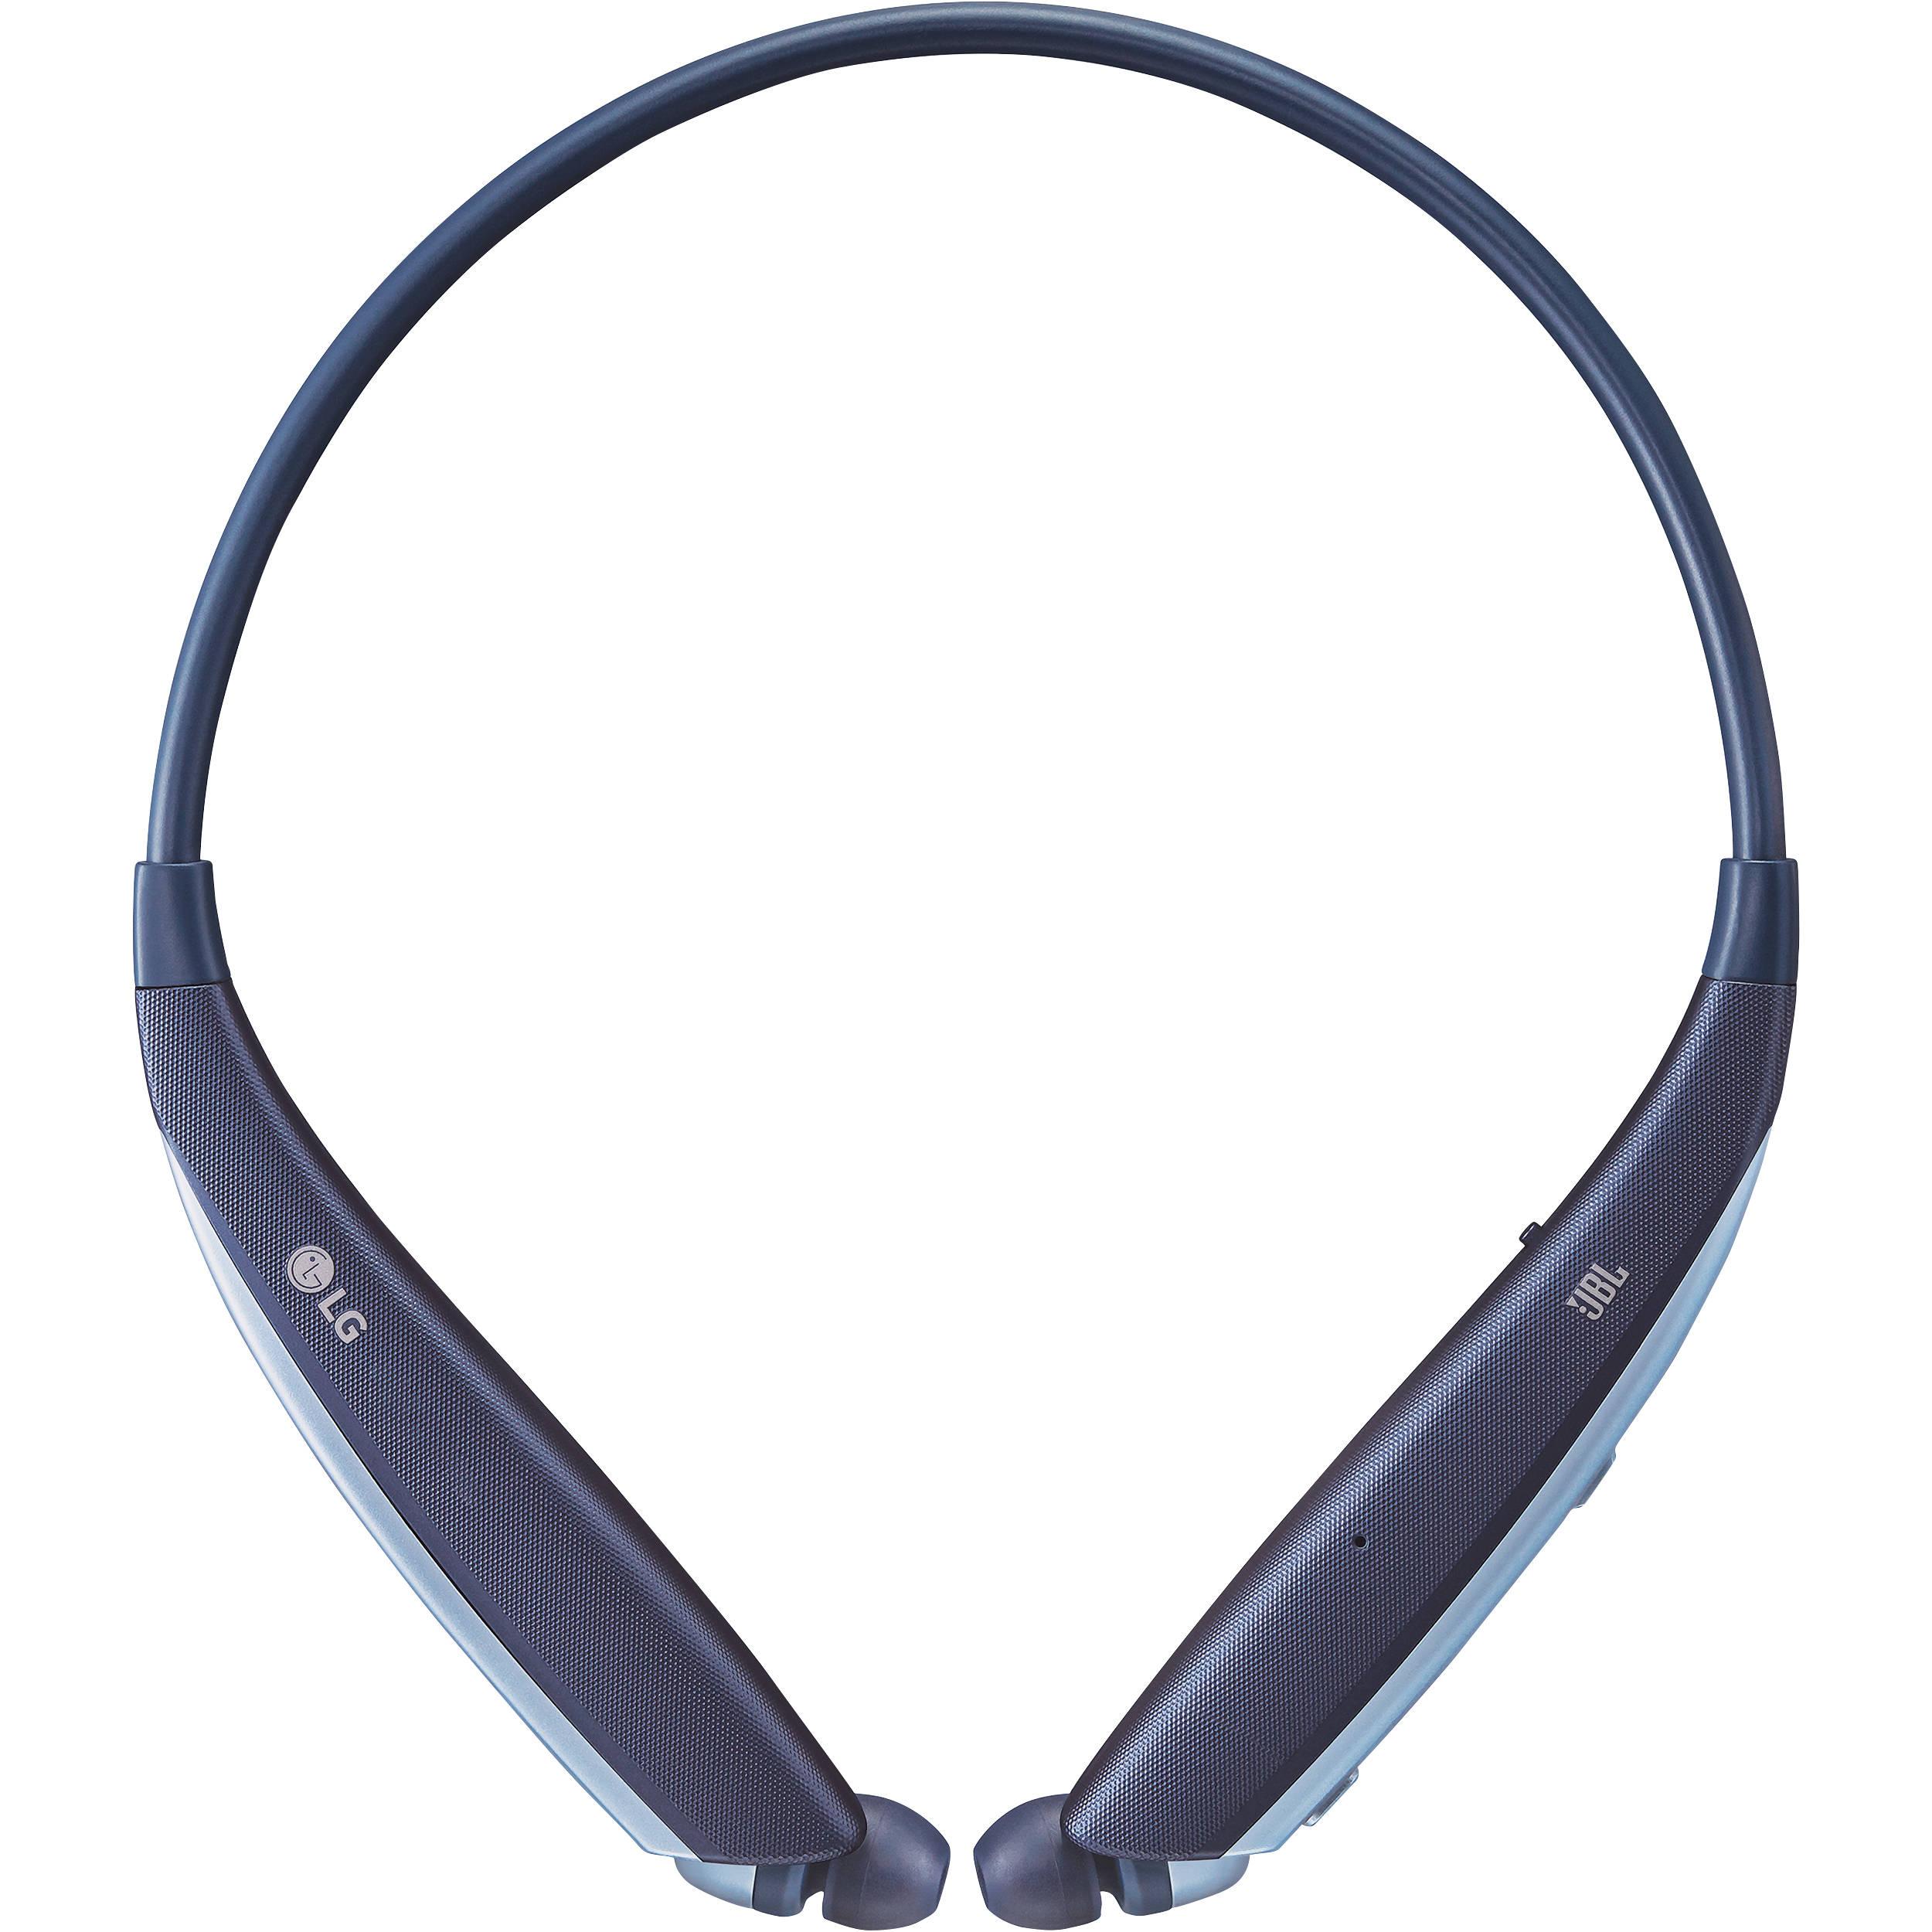 Lg Hbs 835 Tone Ultra Wireless In Ear Headphones Hbs 835 Acusbli